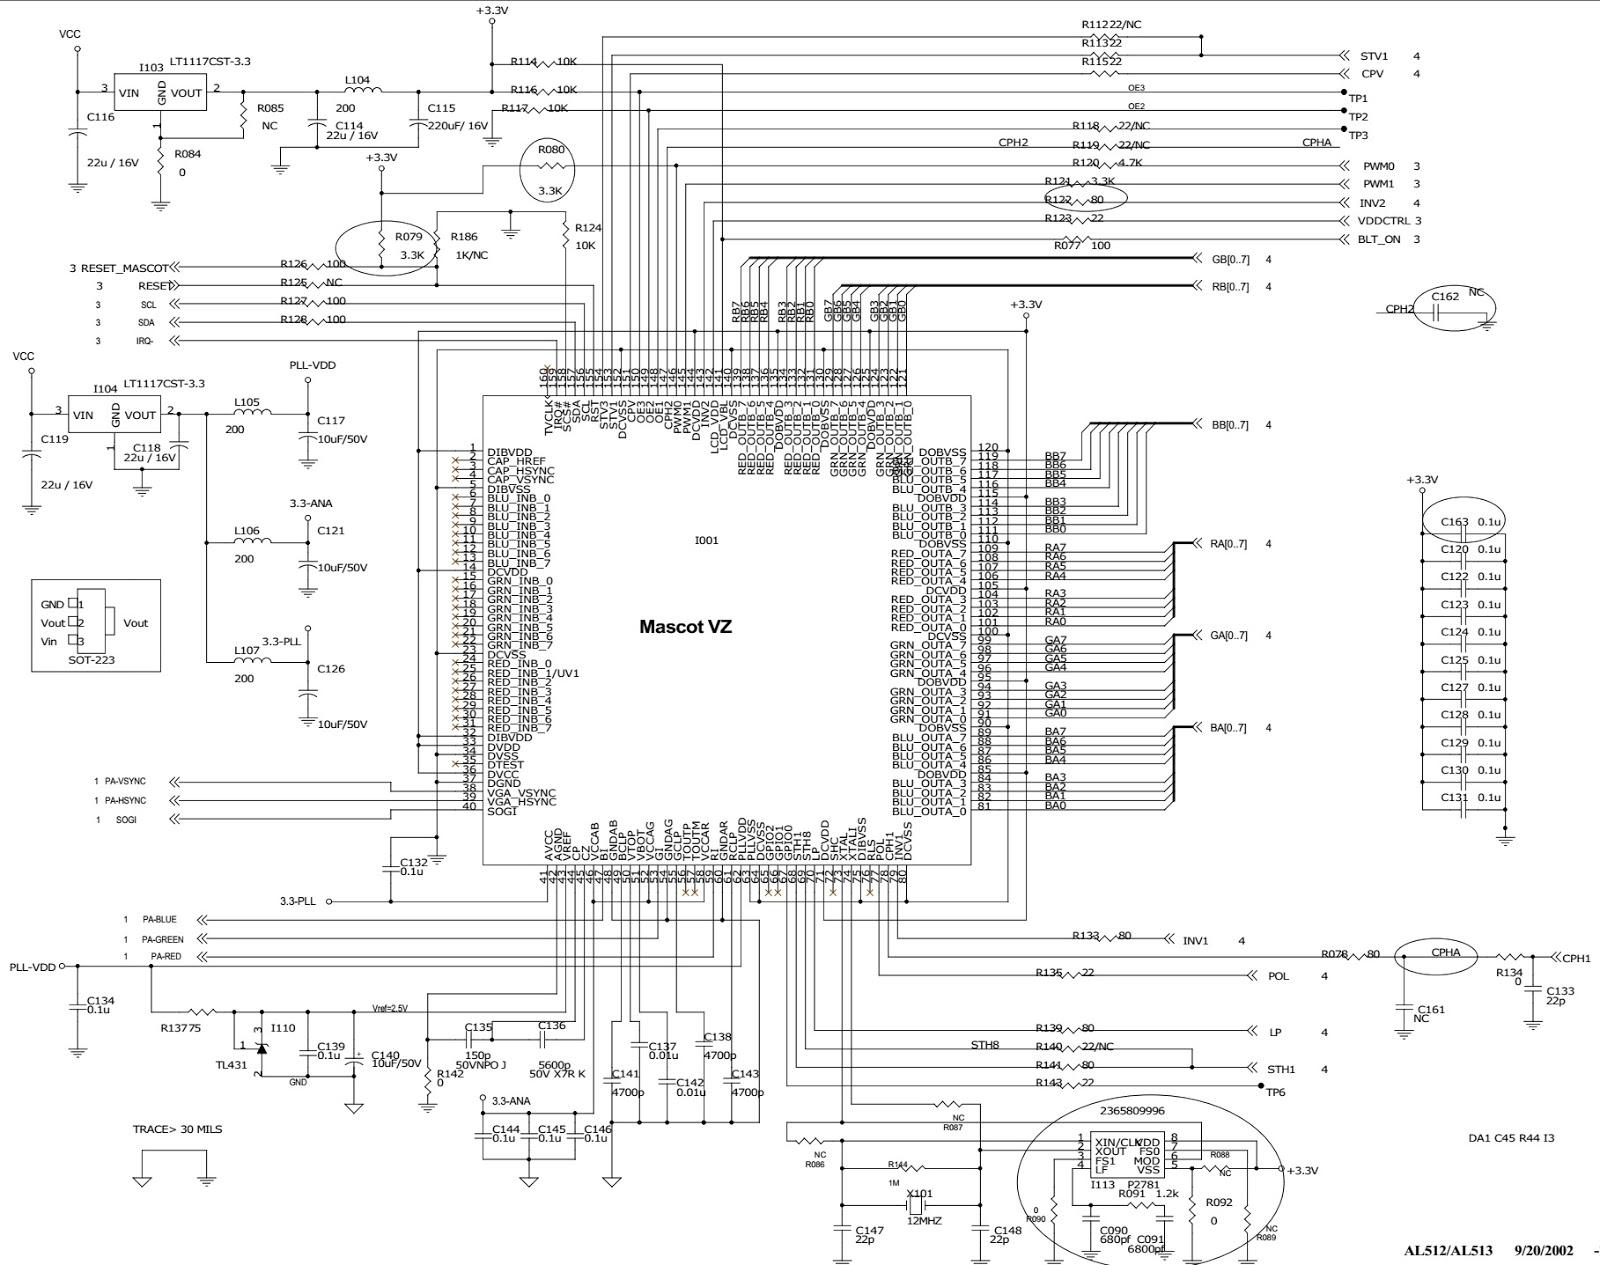 Aoc Al512 Aoc Al513 15 Inch Tft Lcd Monitor Circuit